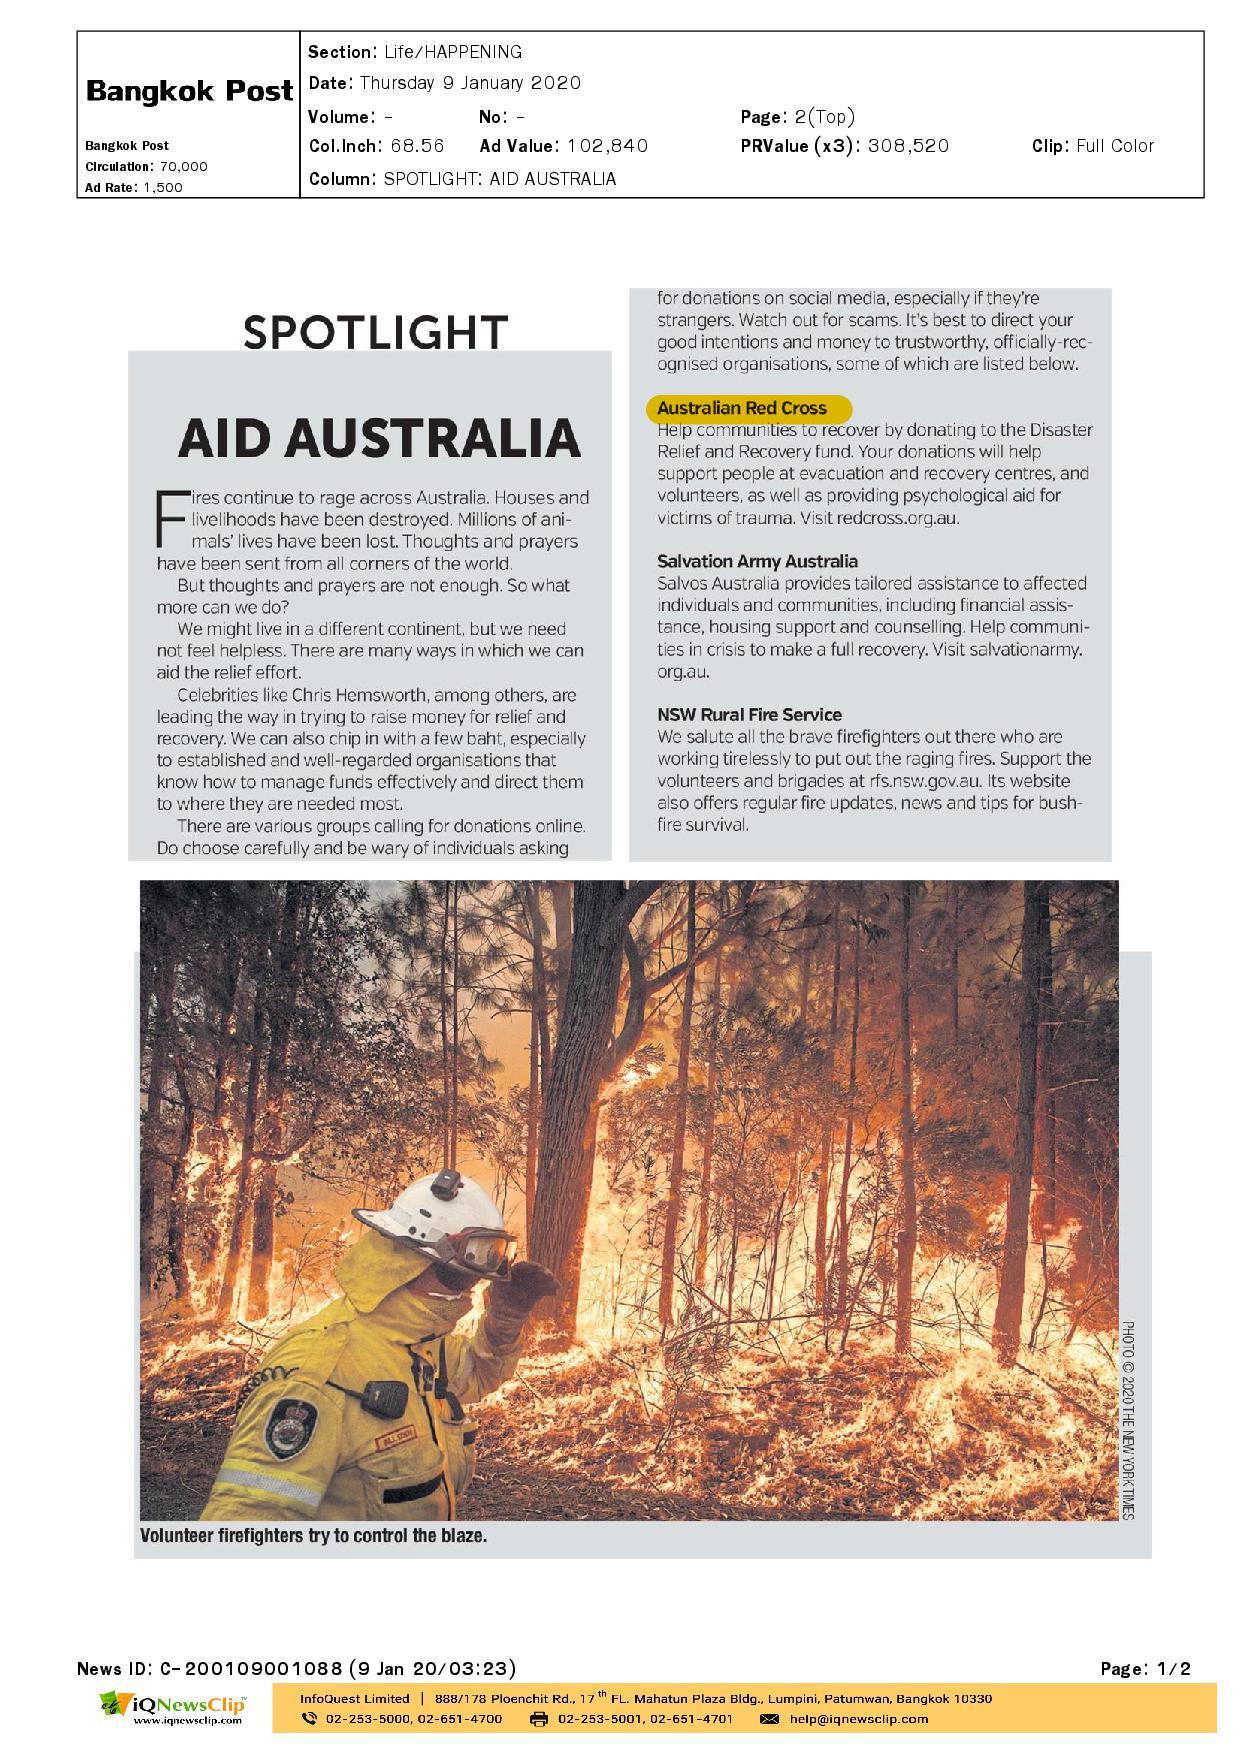 AID AUSTRALIA